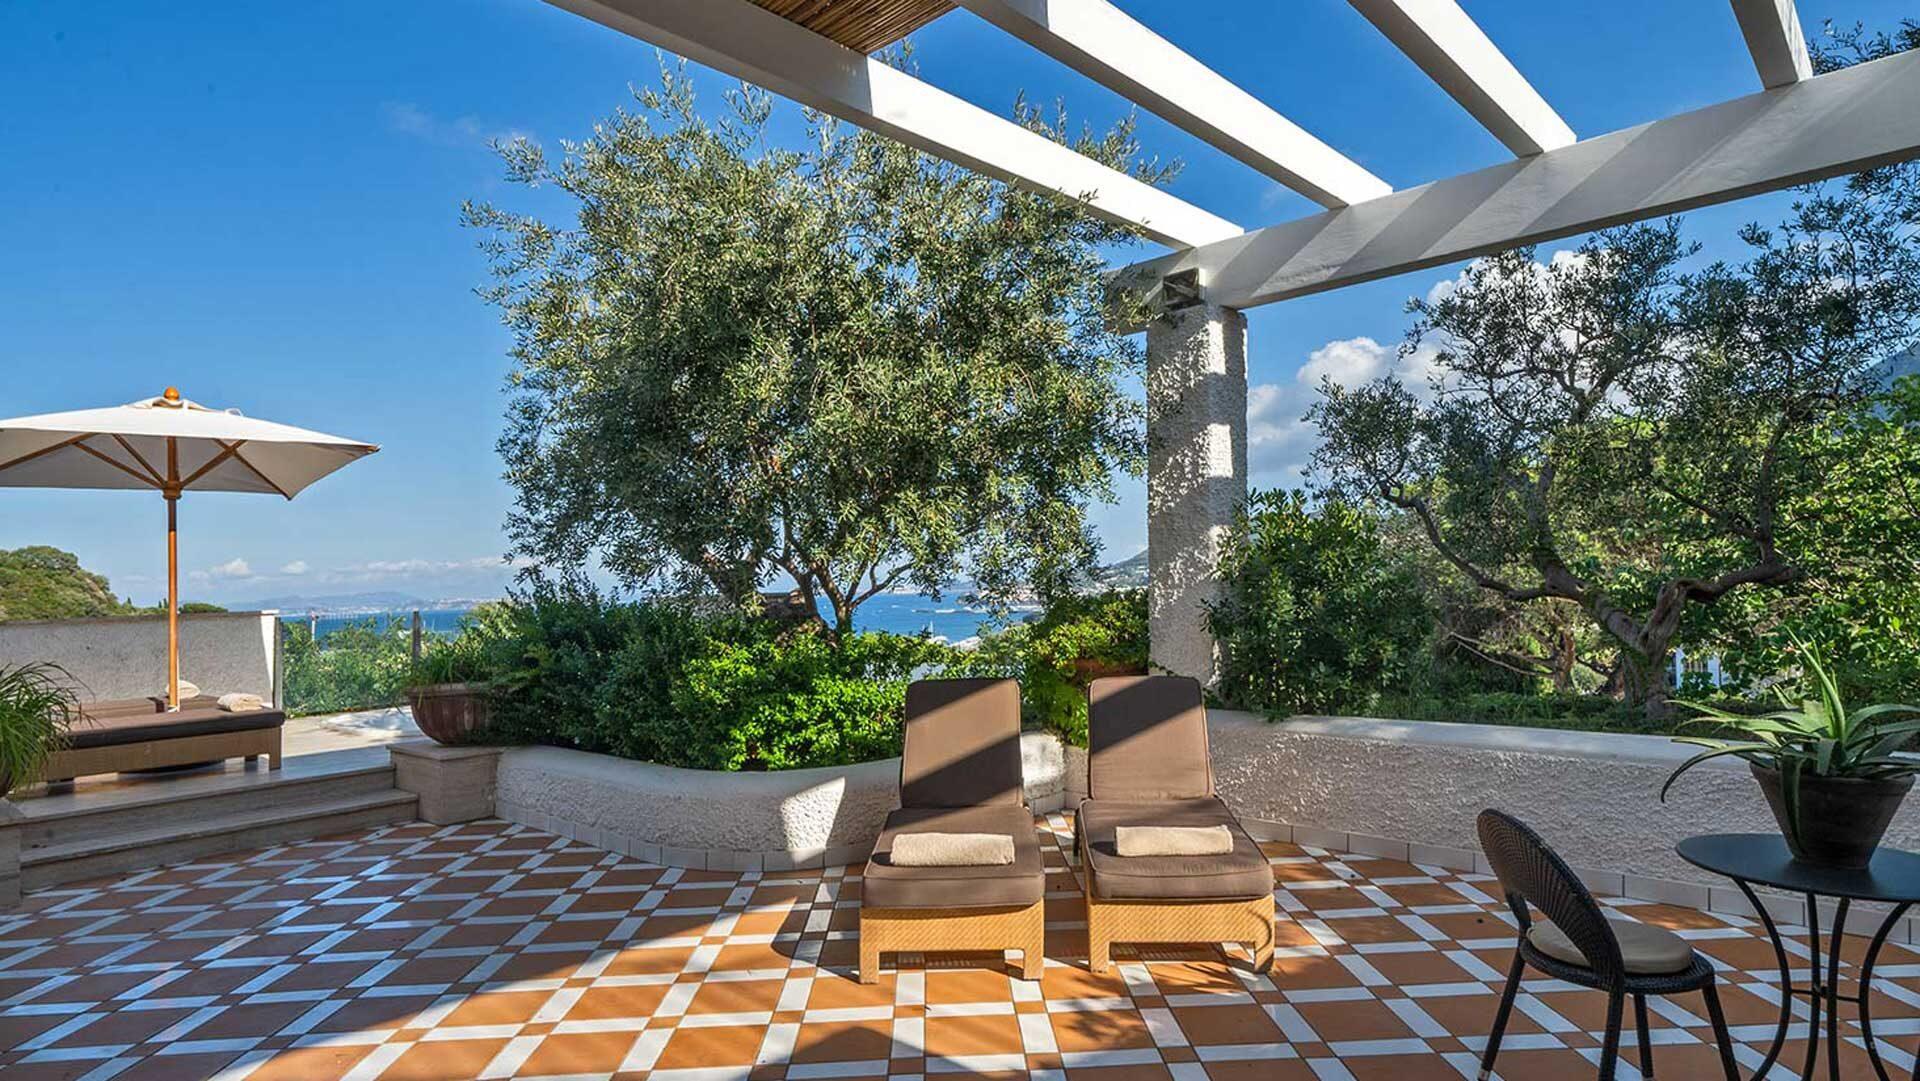 dove-fare-workation-Botania-Relais-Ischia-Level-Office-Landscape